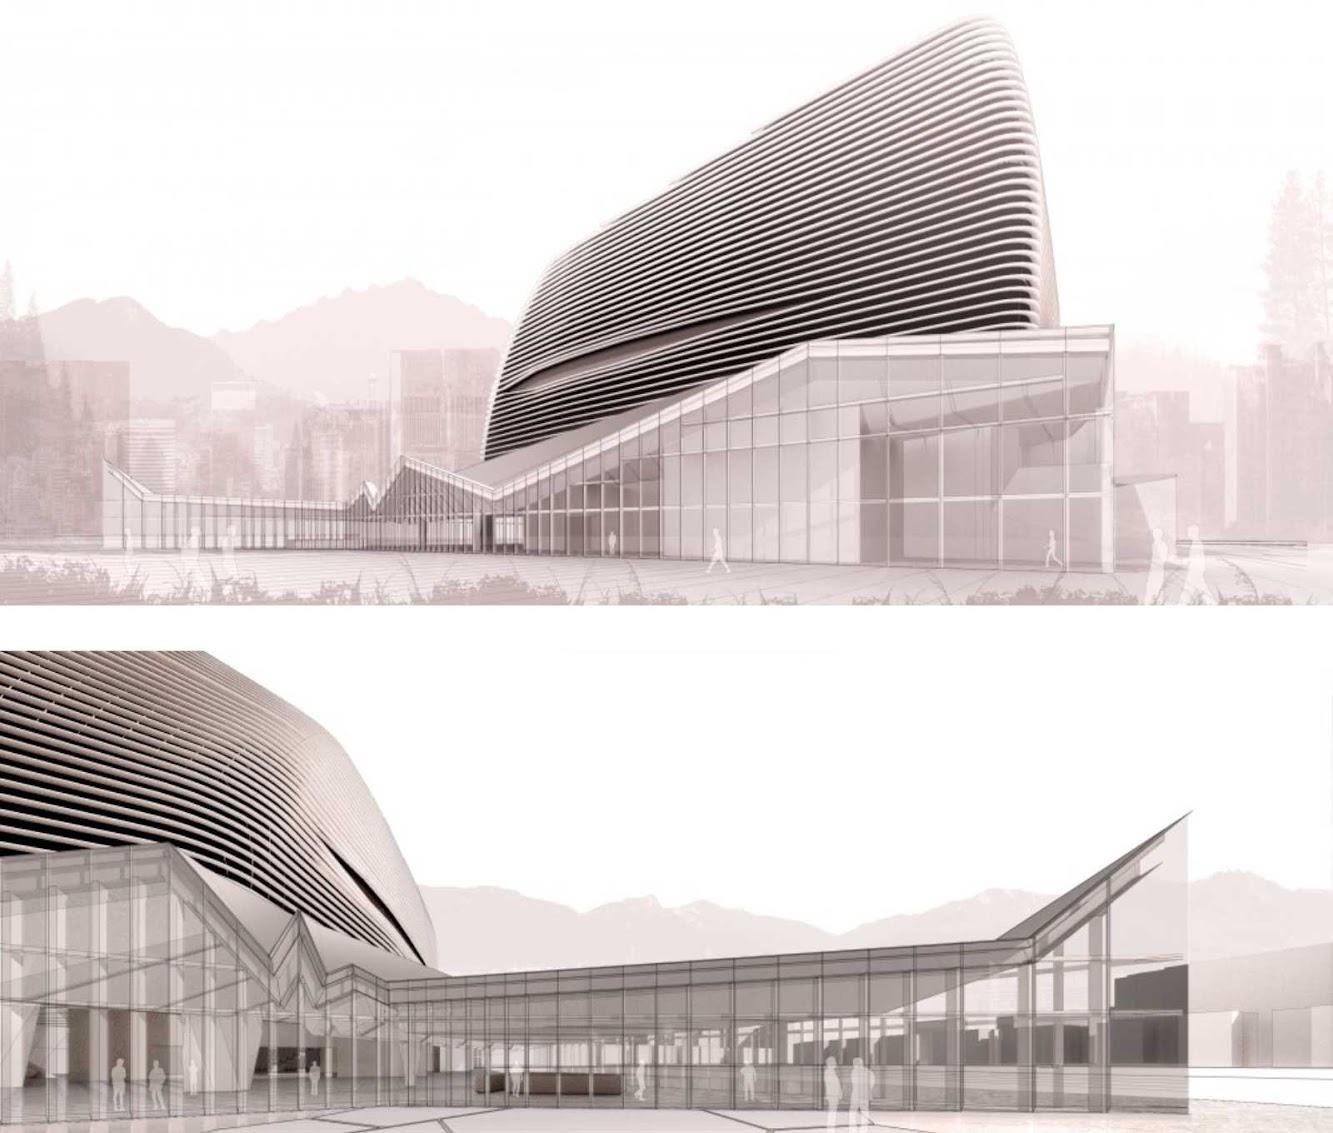 Seul corea del sud model home gallery by nadaaa art for Houseplans vivente del sud